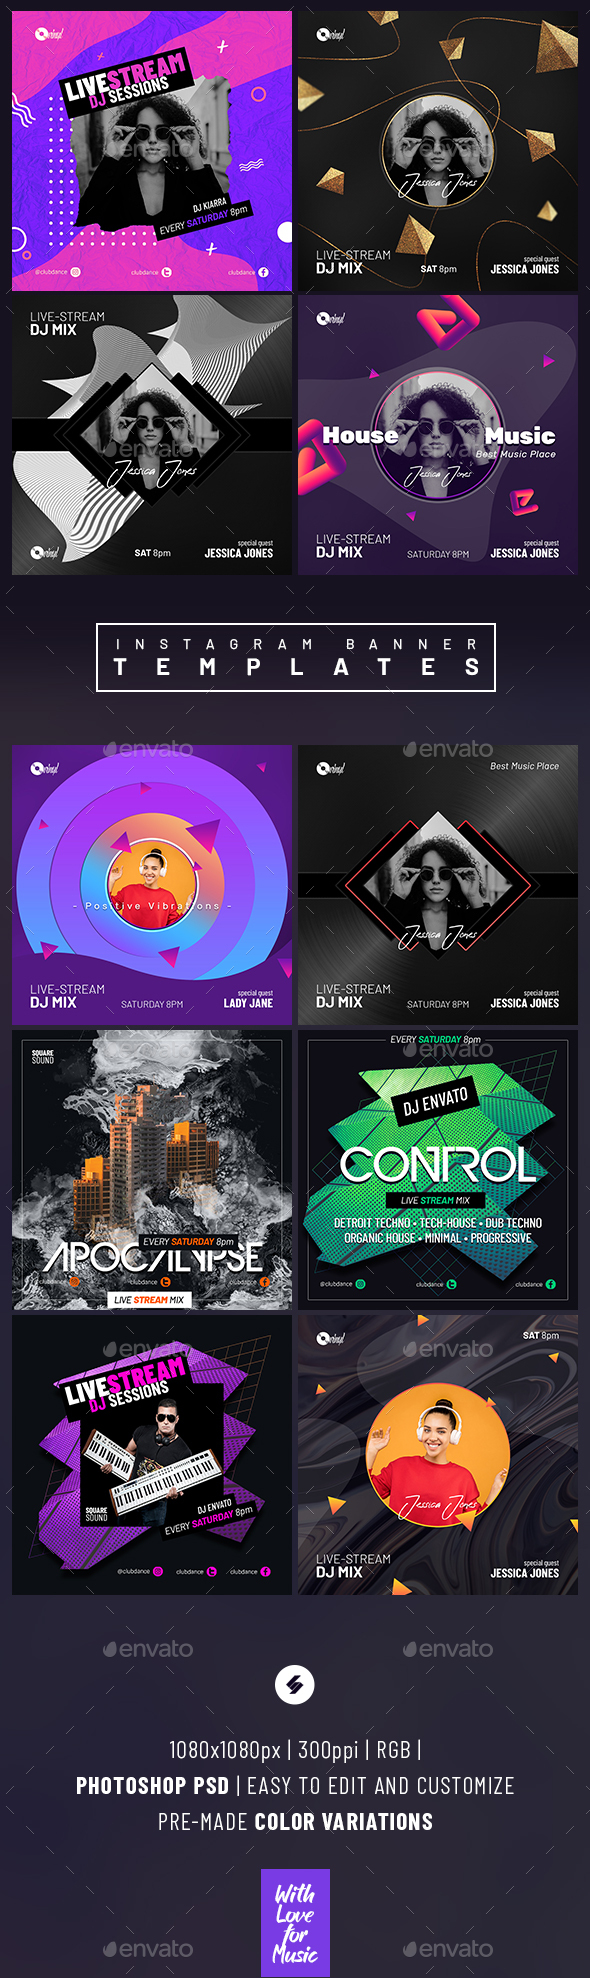 Live Stream DJ Session – Instagram Banner Templates